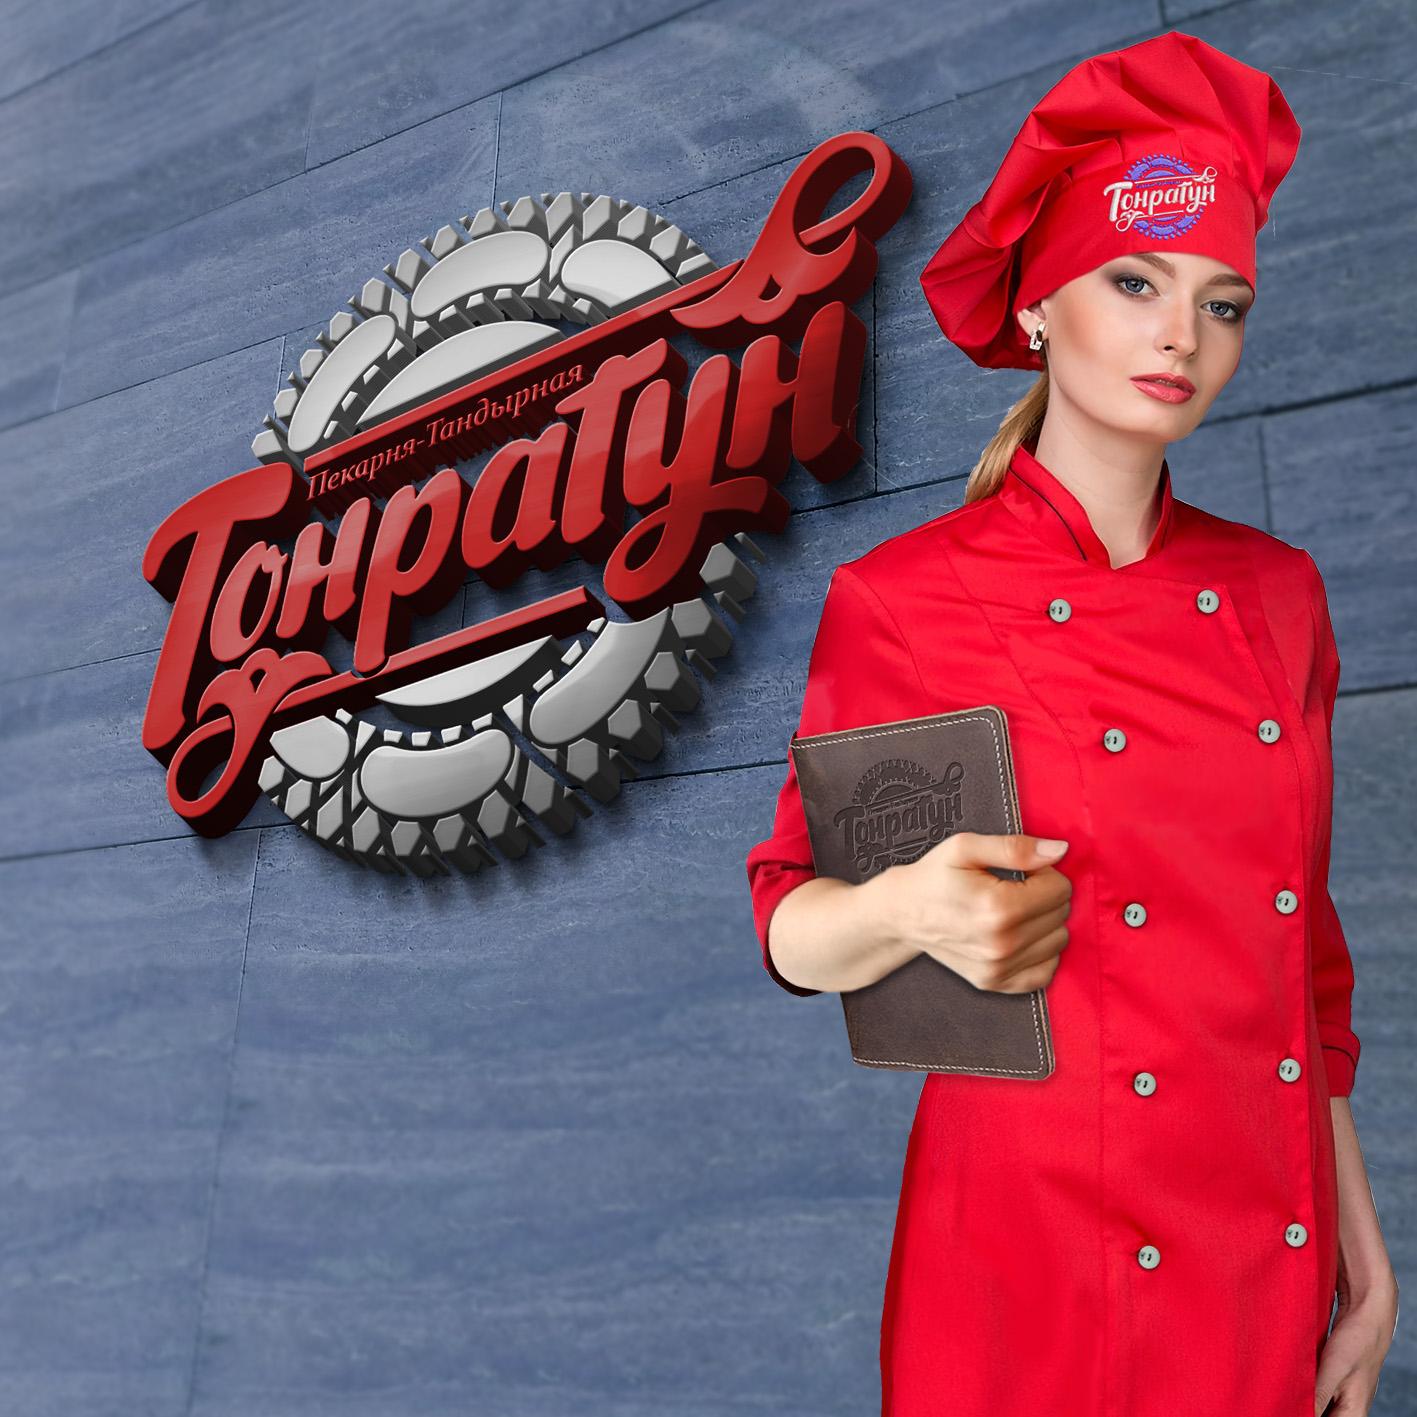 Логотип для Пекарни-Тандырной  фото f_8345d909a6d08a0b.jpg